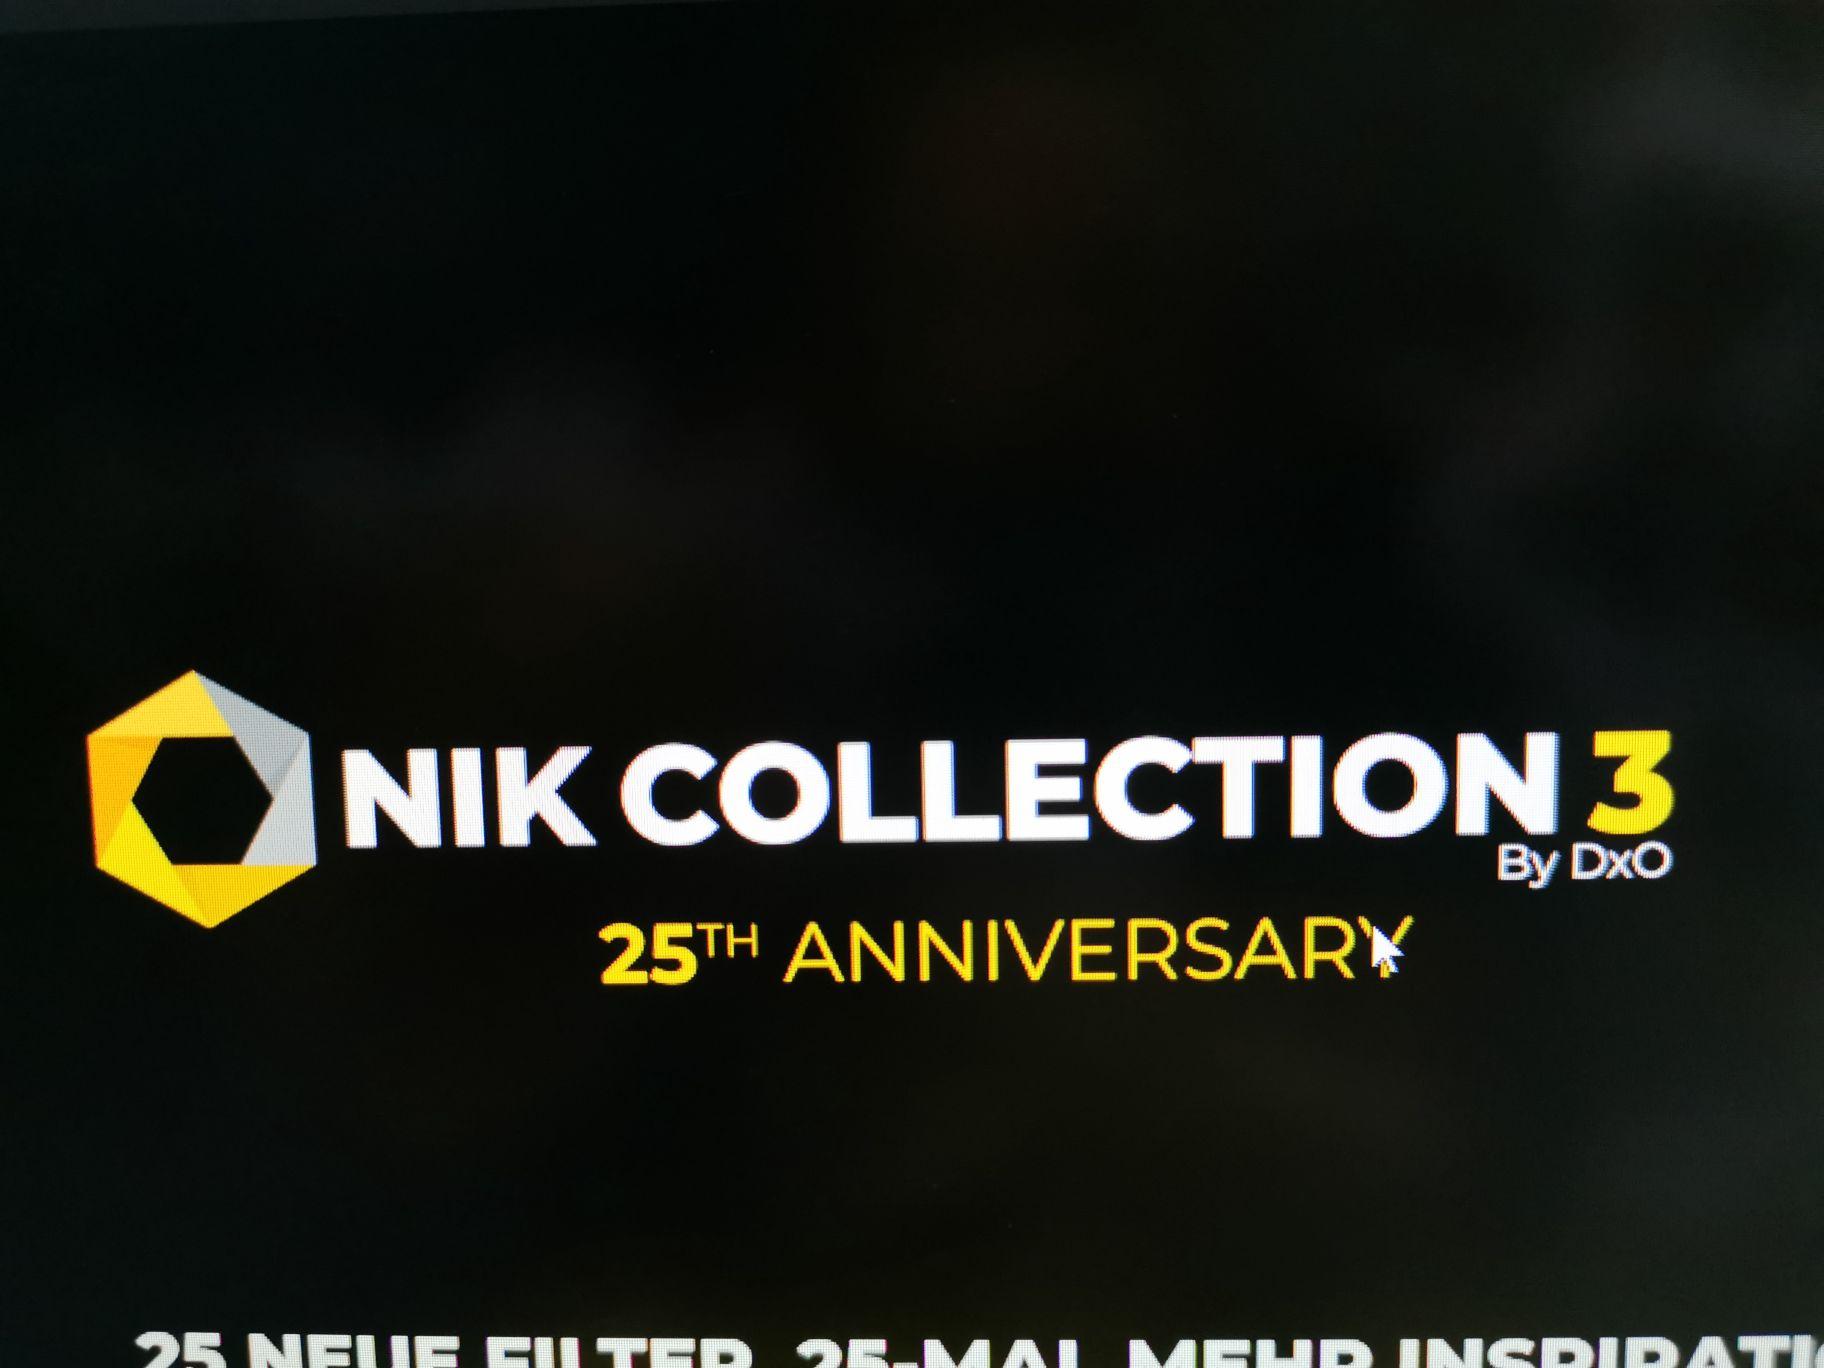 Nik Collection 3 DXO